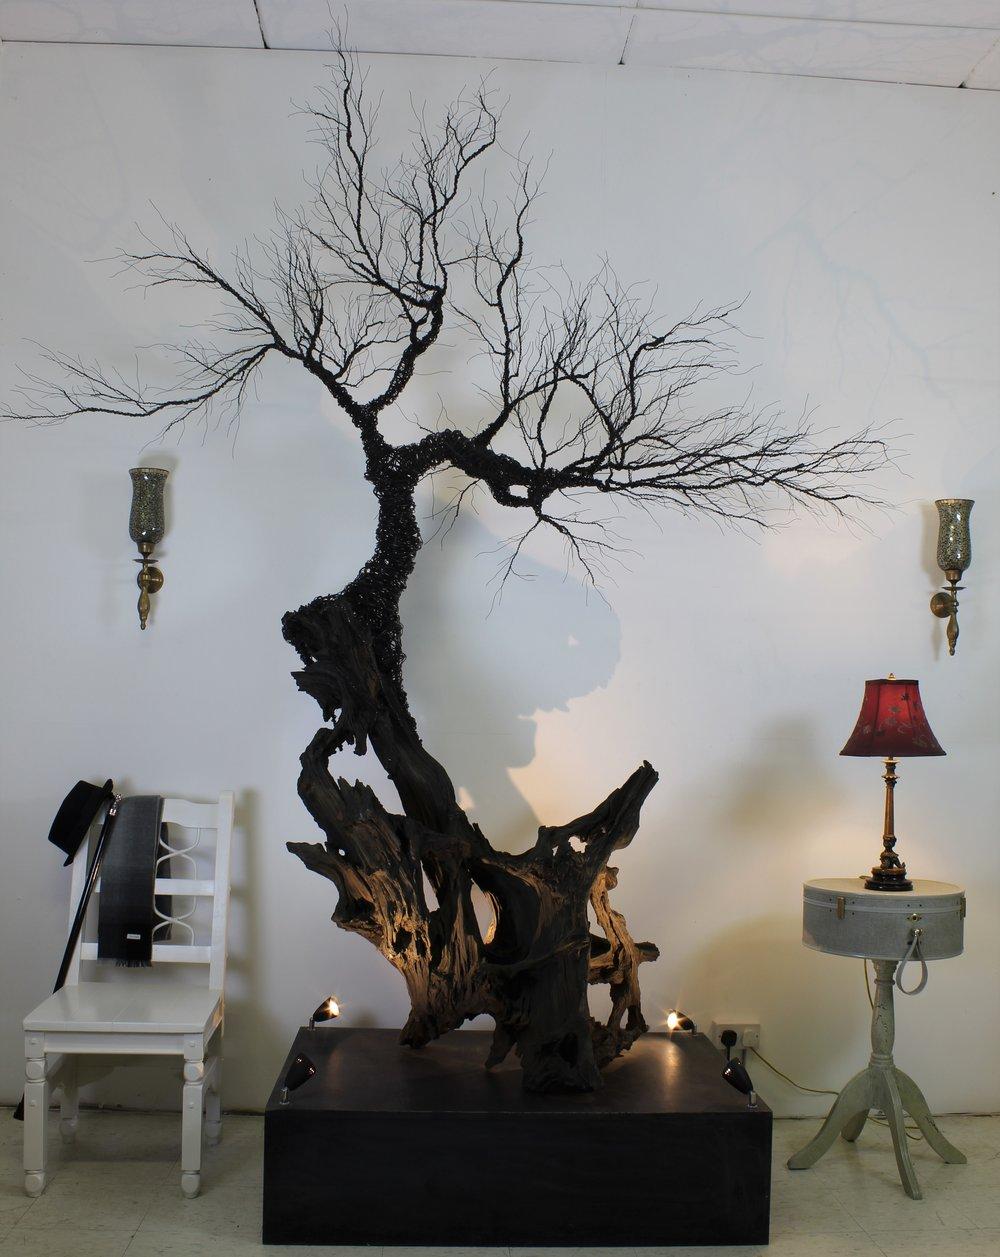 faerie tree studio shot.jpg